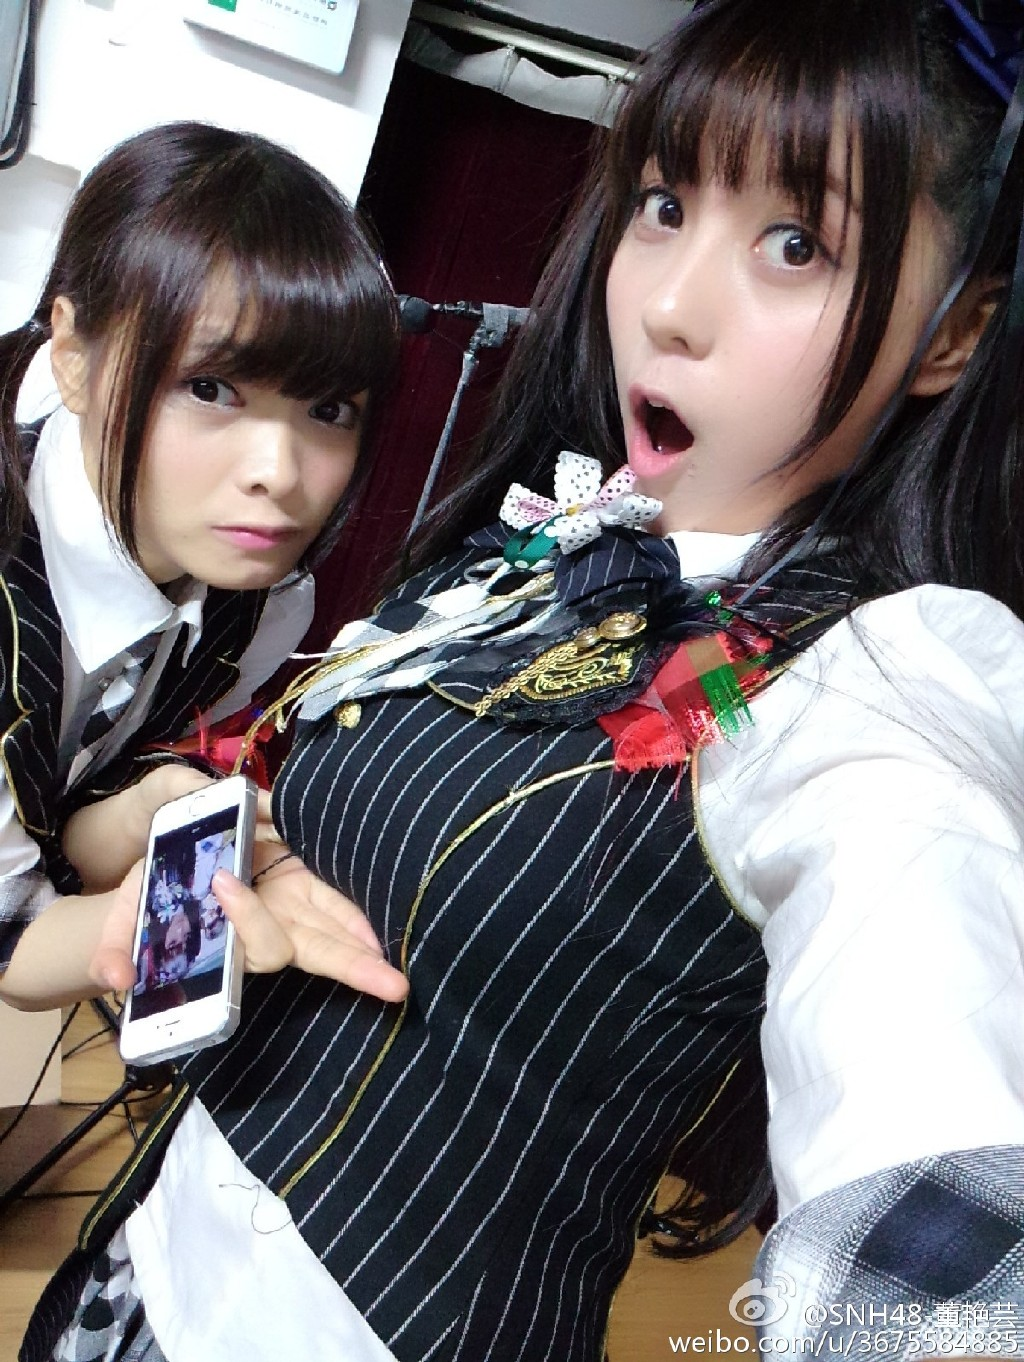 SNH48で最強の胸厚メンバー董艷芸(パンダ)のプロフィールを更新しました